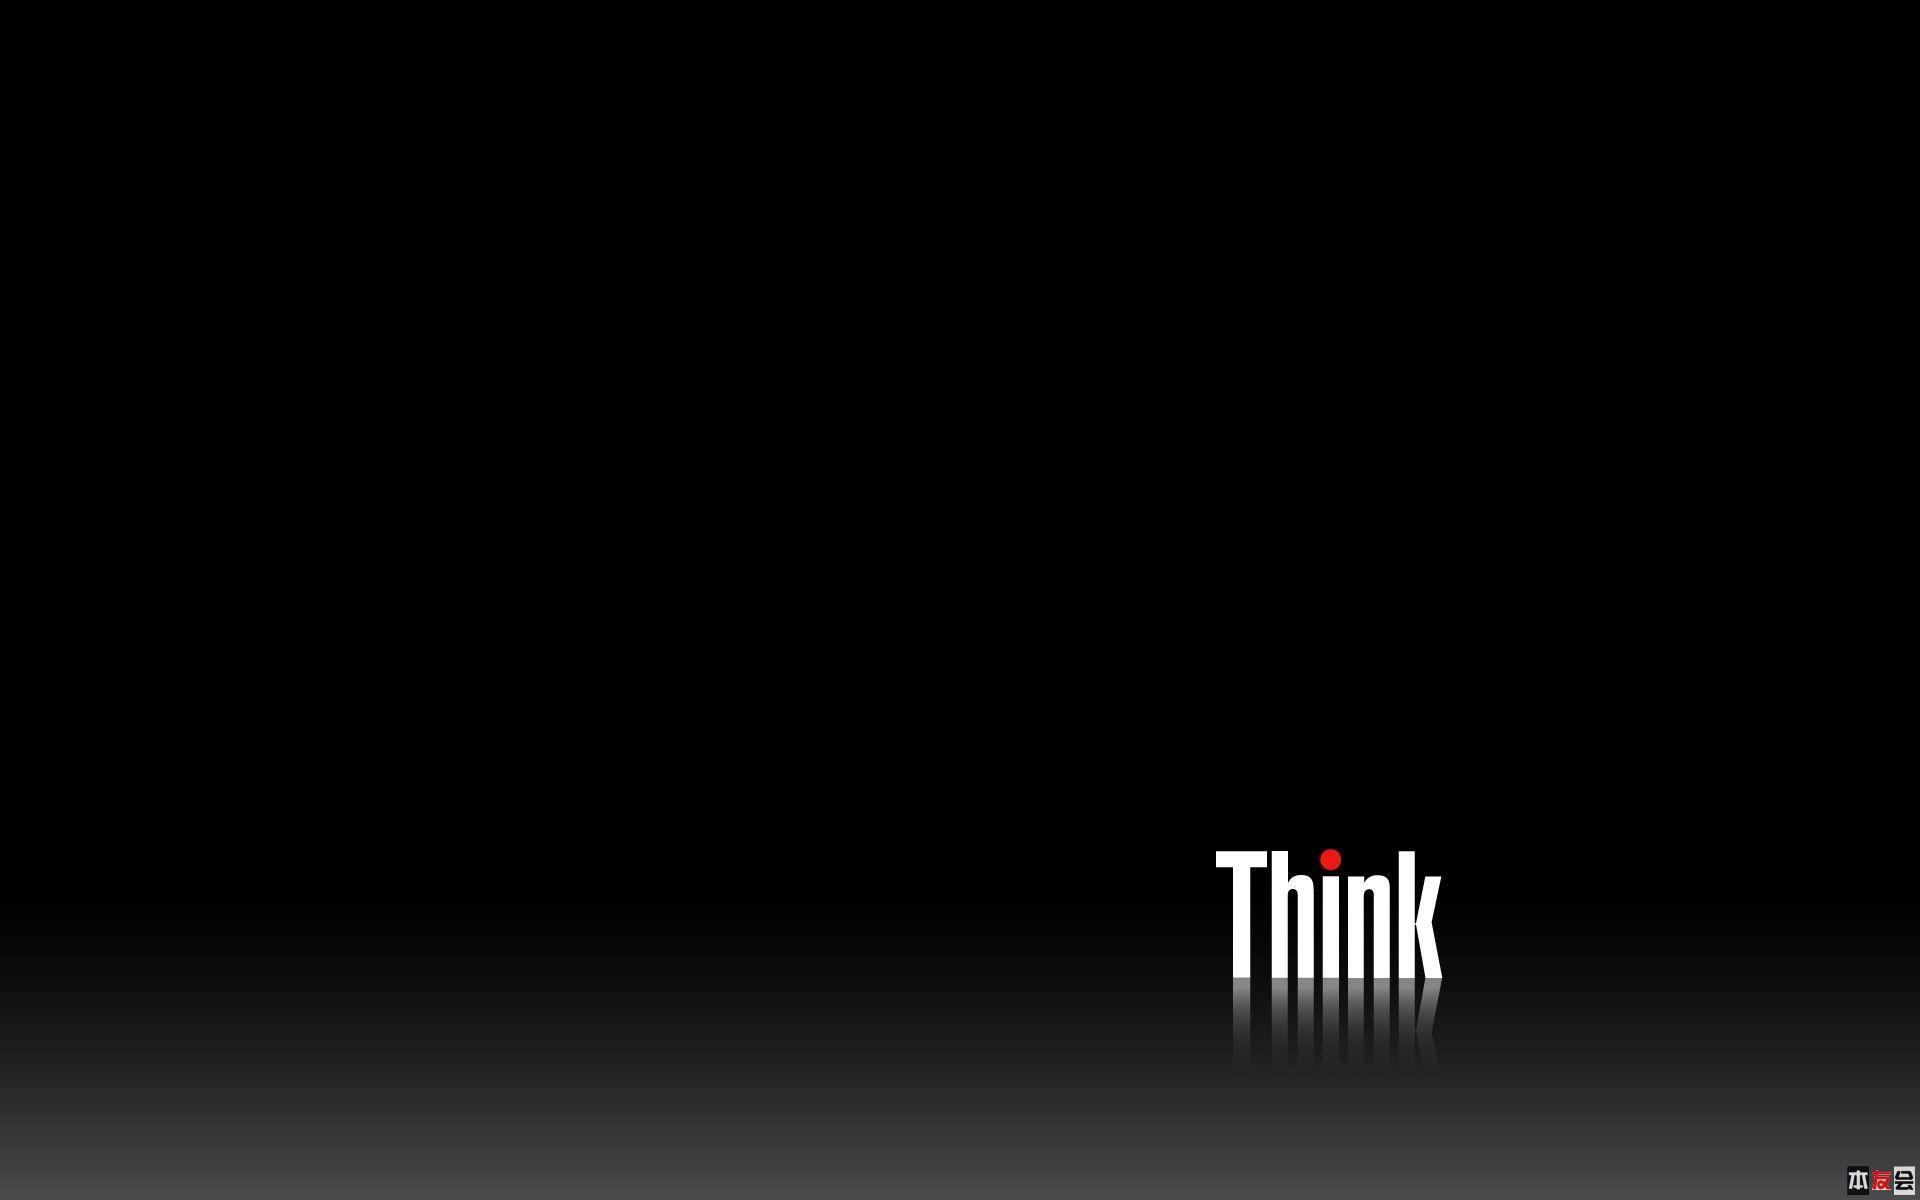 3think_black.jpg